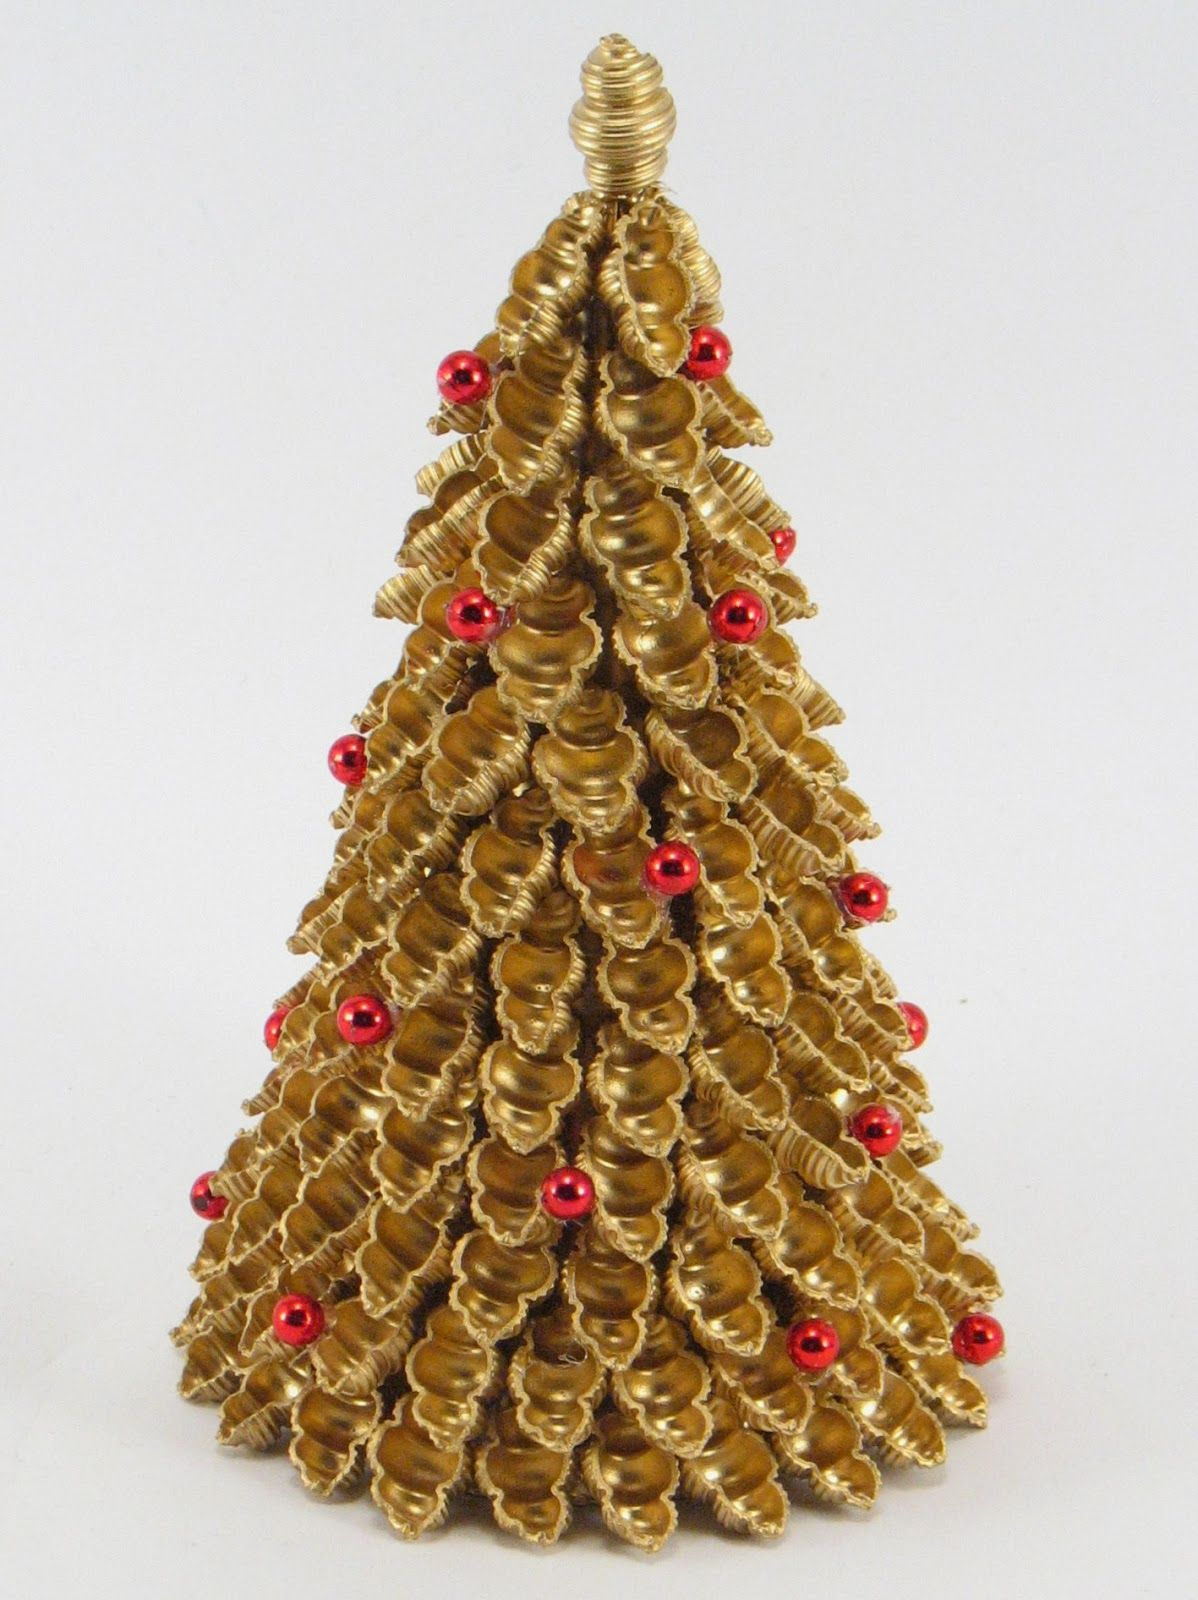 Resultado De Imagen Para Pisanki Makaronowe Christmas Tree Crafts Christmas Crafts Decorations Unique Christmas Decorations